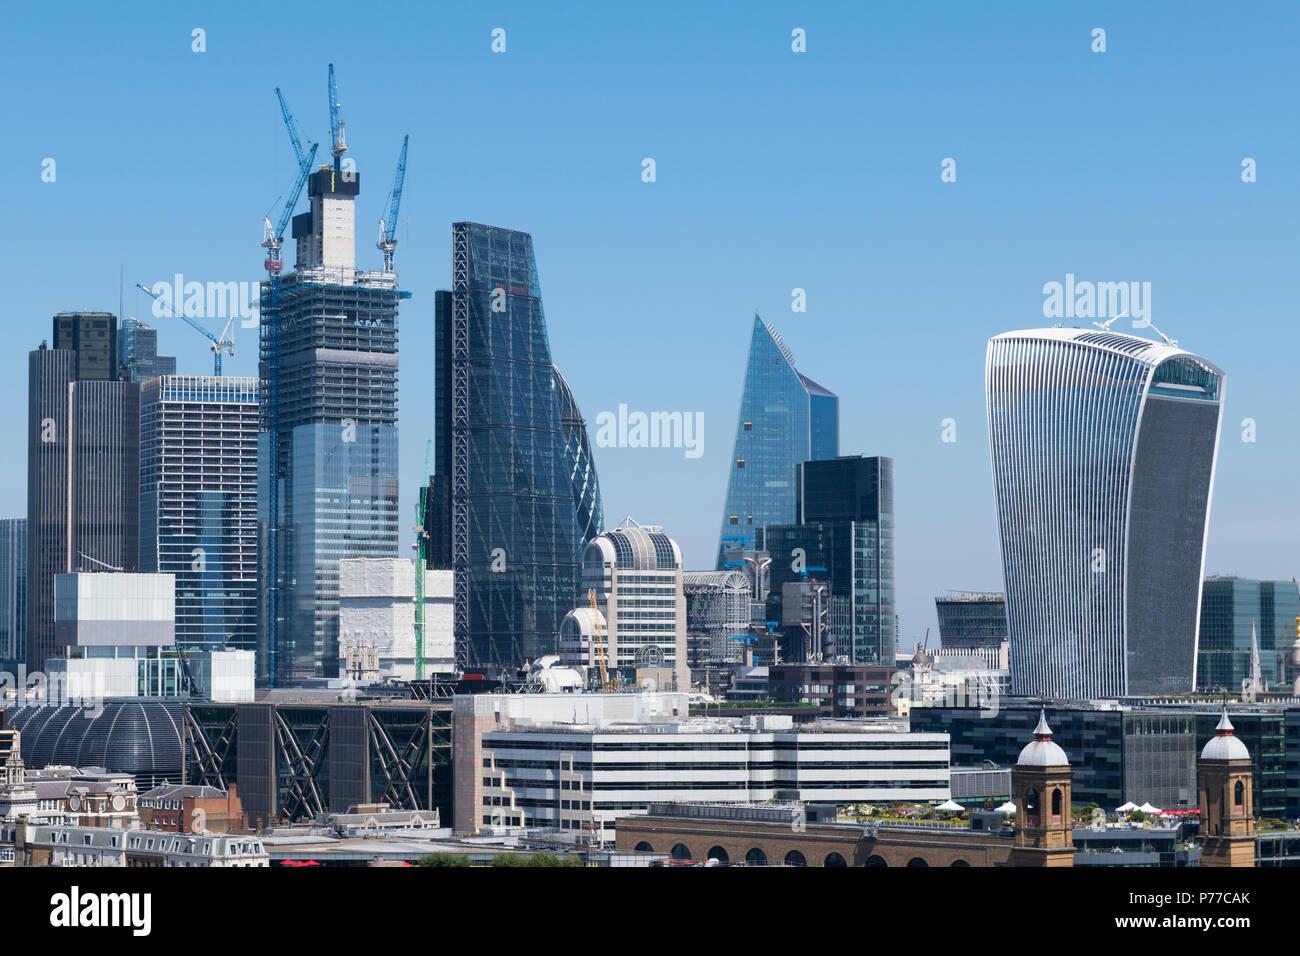 London City Cityscape modern landmark buildings Walkie Talkie Gherkin Scalpel River Thames Southwark Bridge Cannon Street Station Vintners Hall - Stock Image